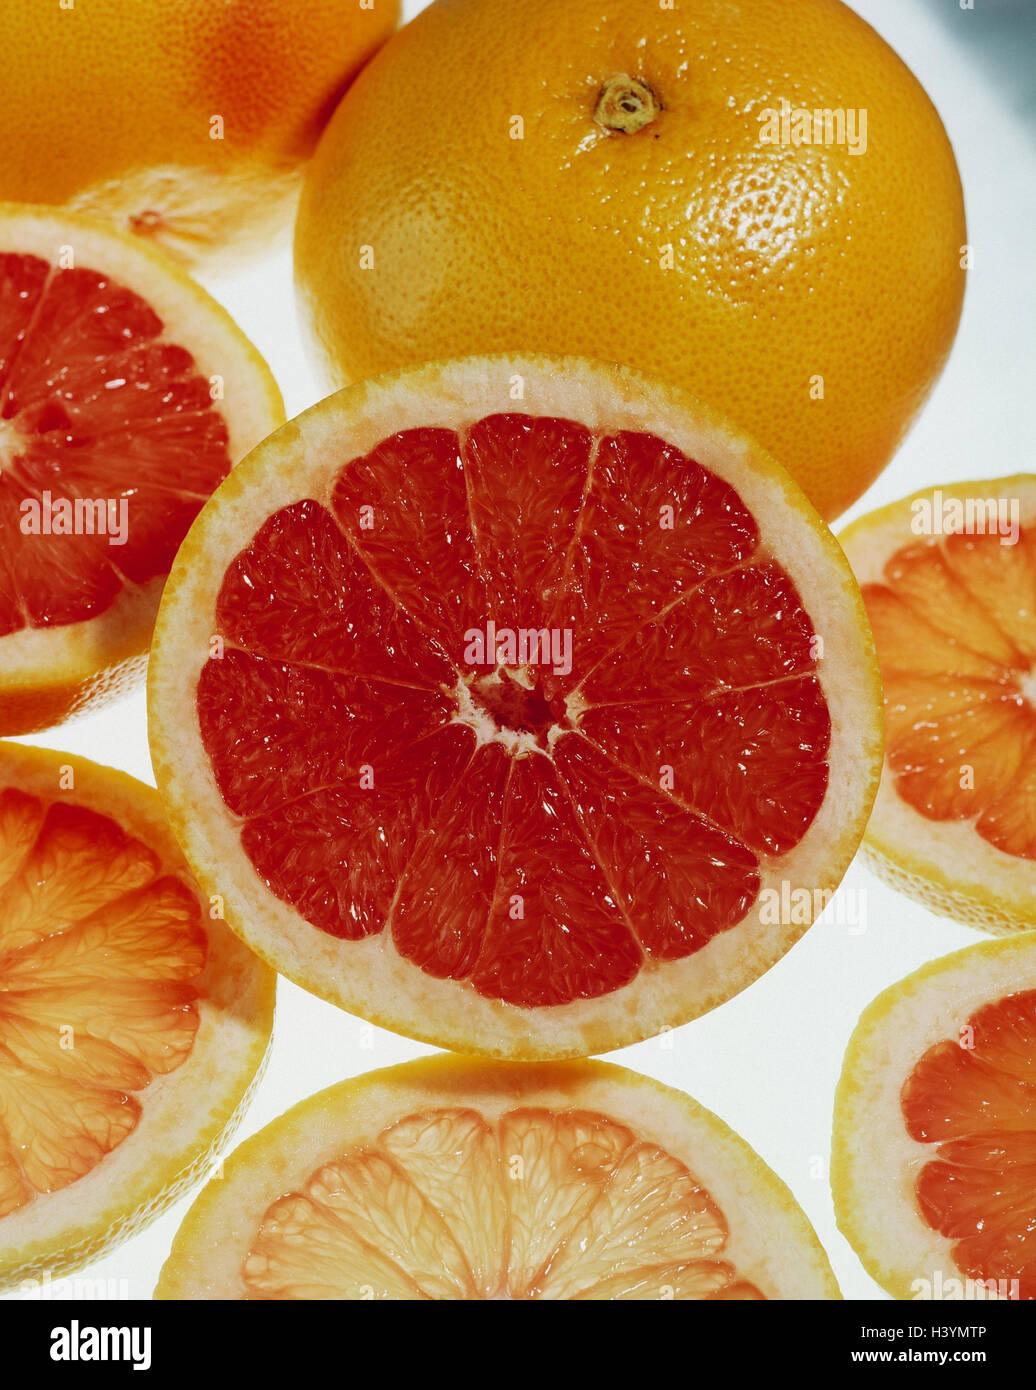 cut out, blood orange, orange, oranges, orange, vitamin C, vitamins, rich in vitamins, fruit, fruits, fruit, Citrus - Stock Image